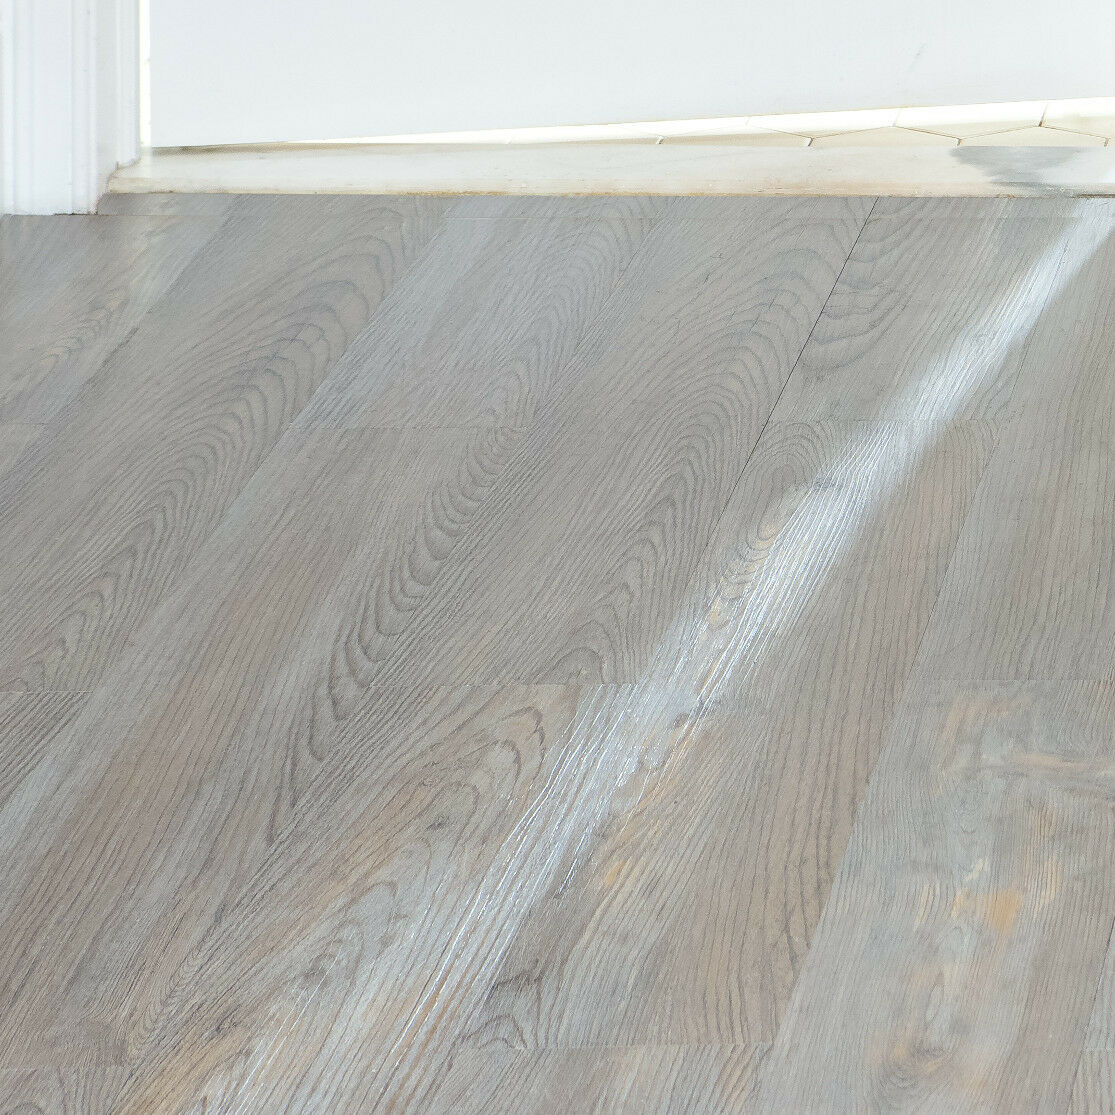 Vinyl plank floor tile espresso wood grain look feel self picture 1 of 3 dailygadgetfo Gallery